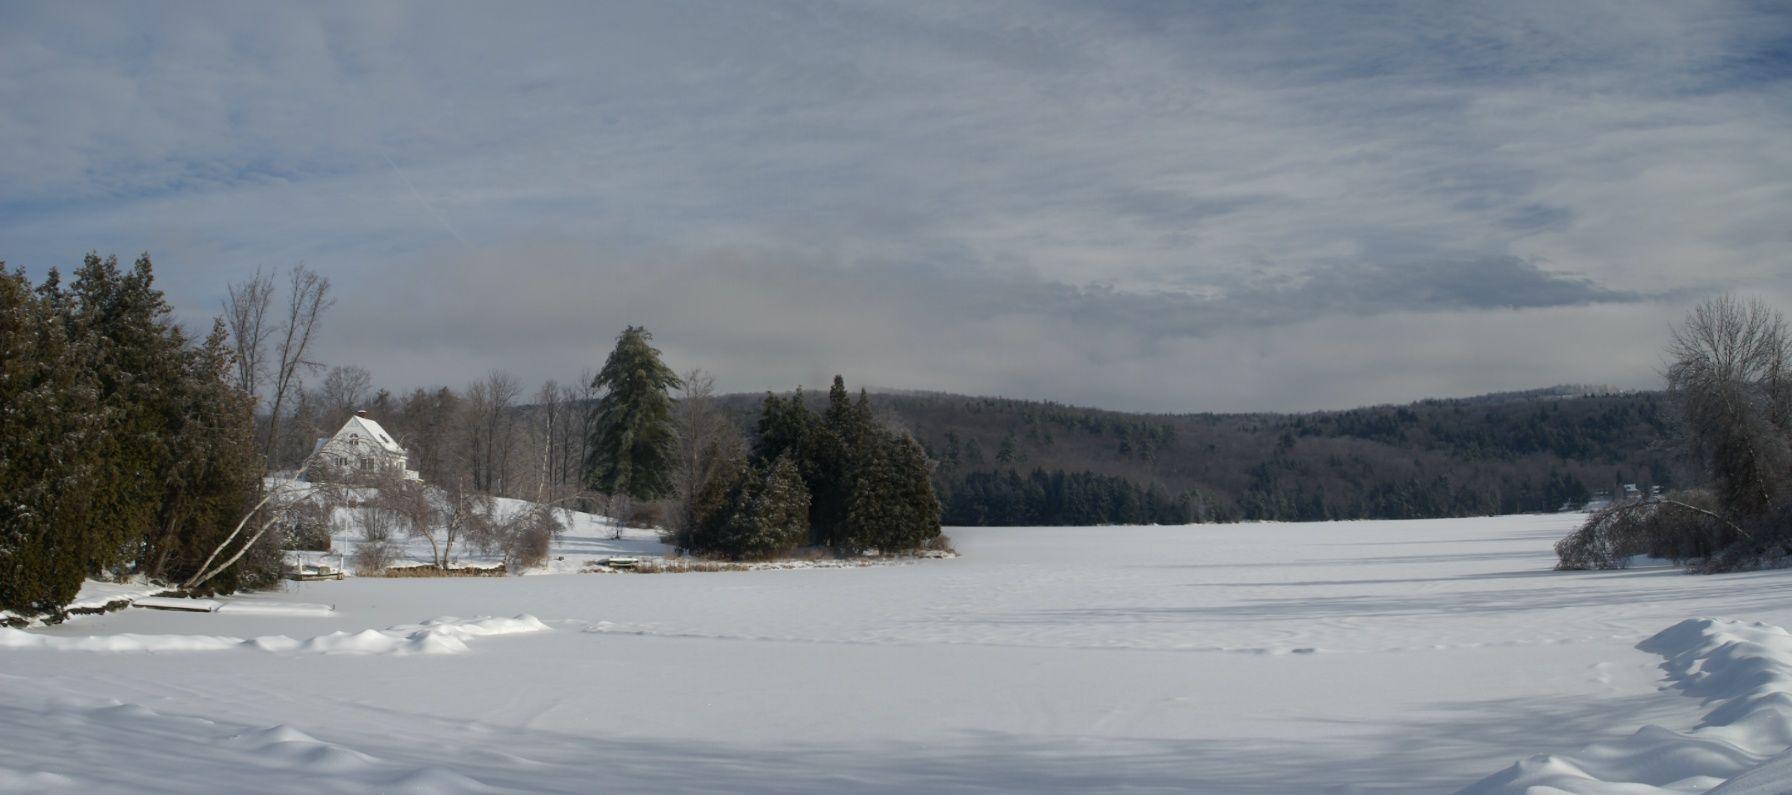 Woodstock Vt Area Silver Lake In Barnard Vermont Wonderful Winter In Vermont Vermont Winter Woodstock Vt